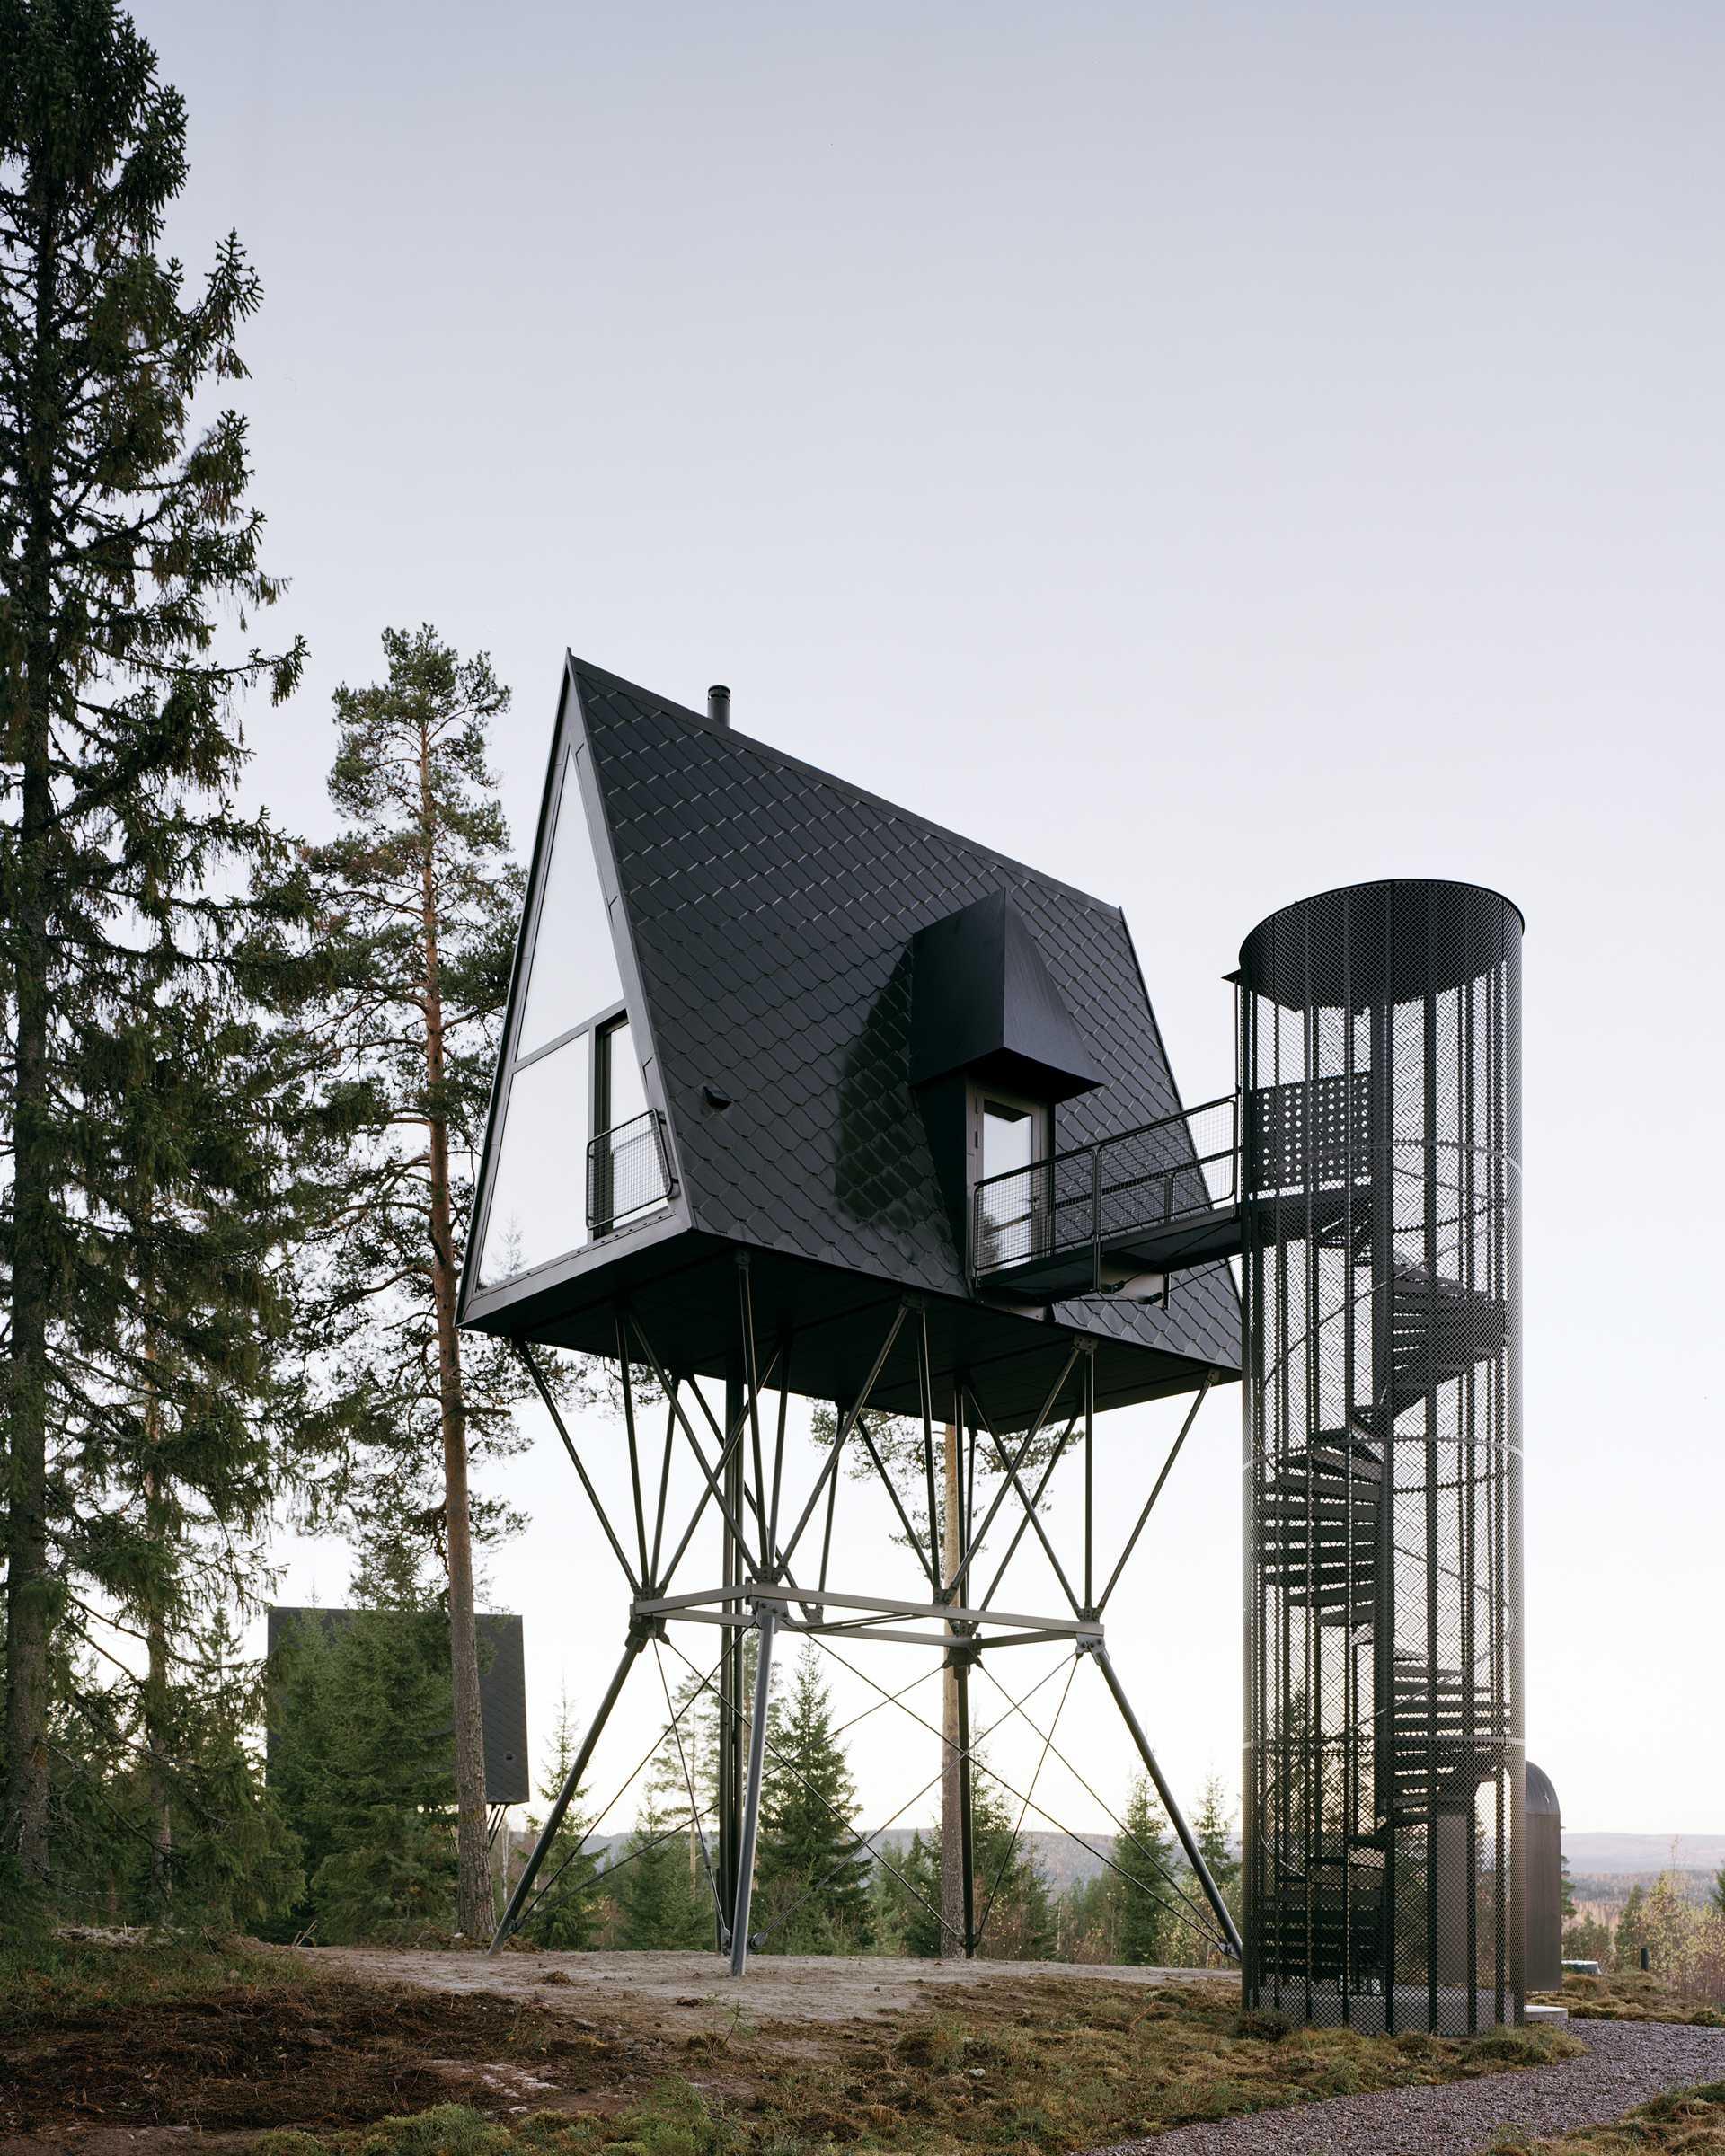 PAN-cabins  - 1 4.0 36